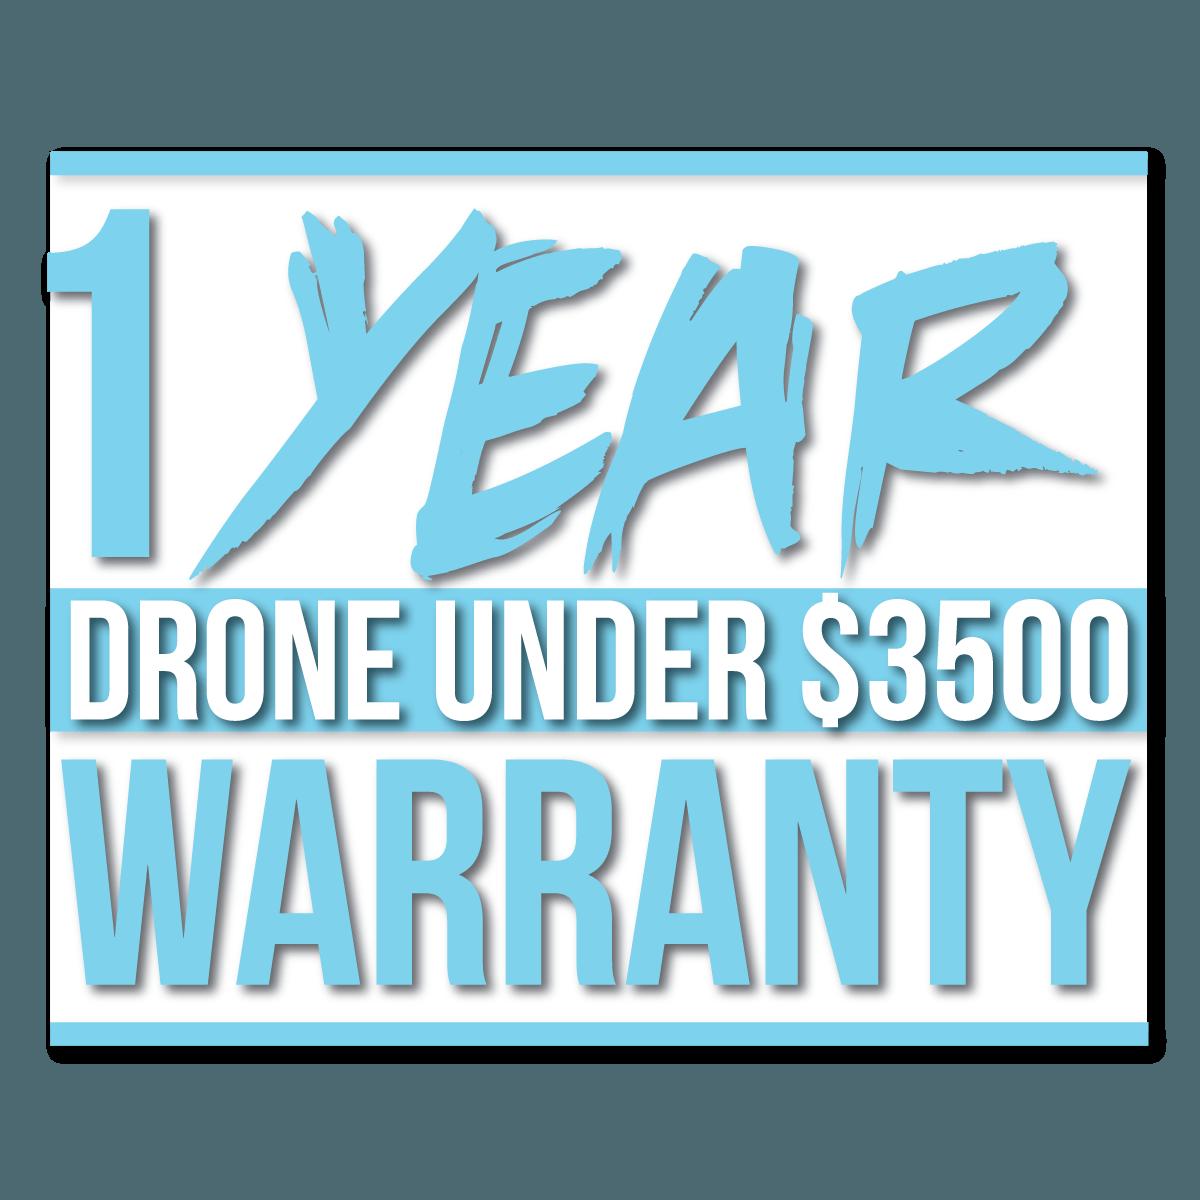 cps-warranty-verydrone